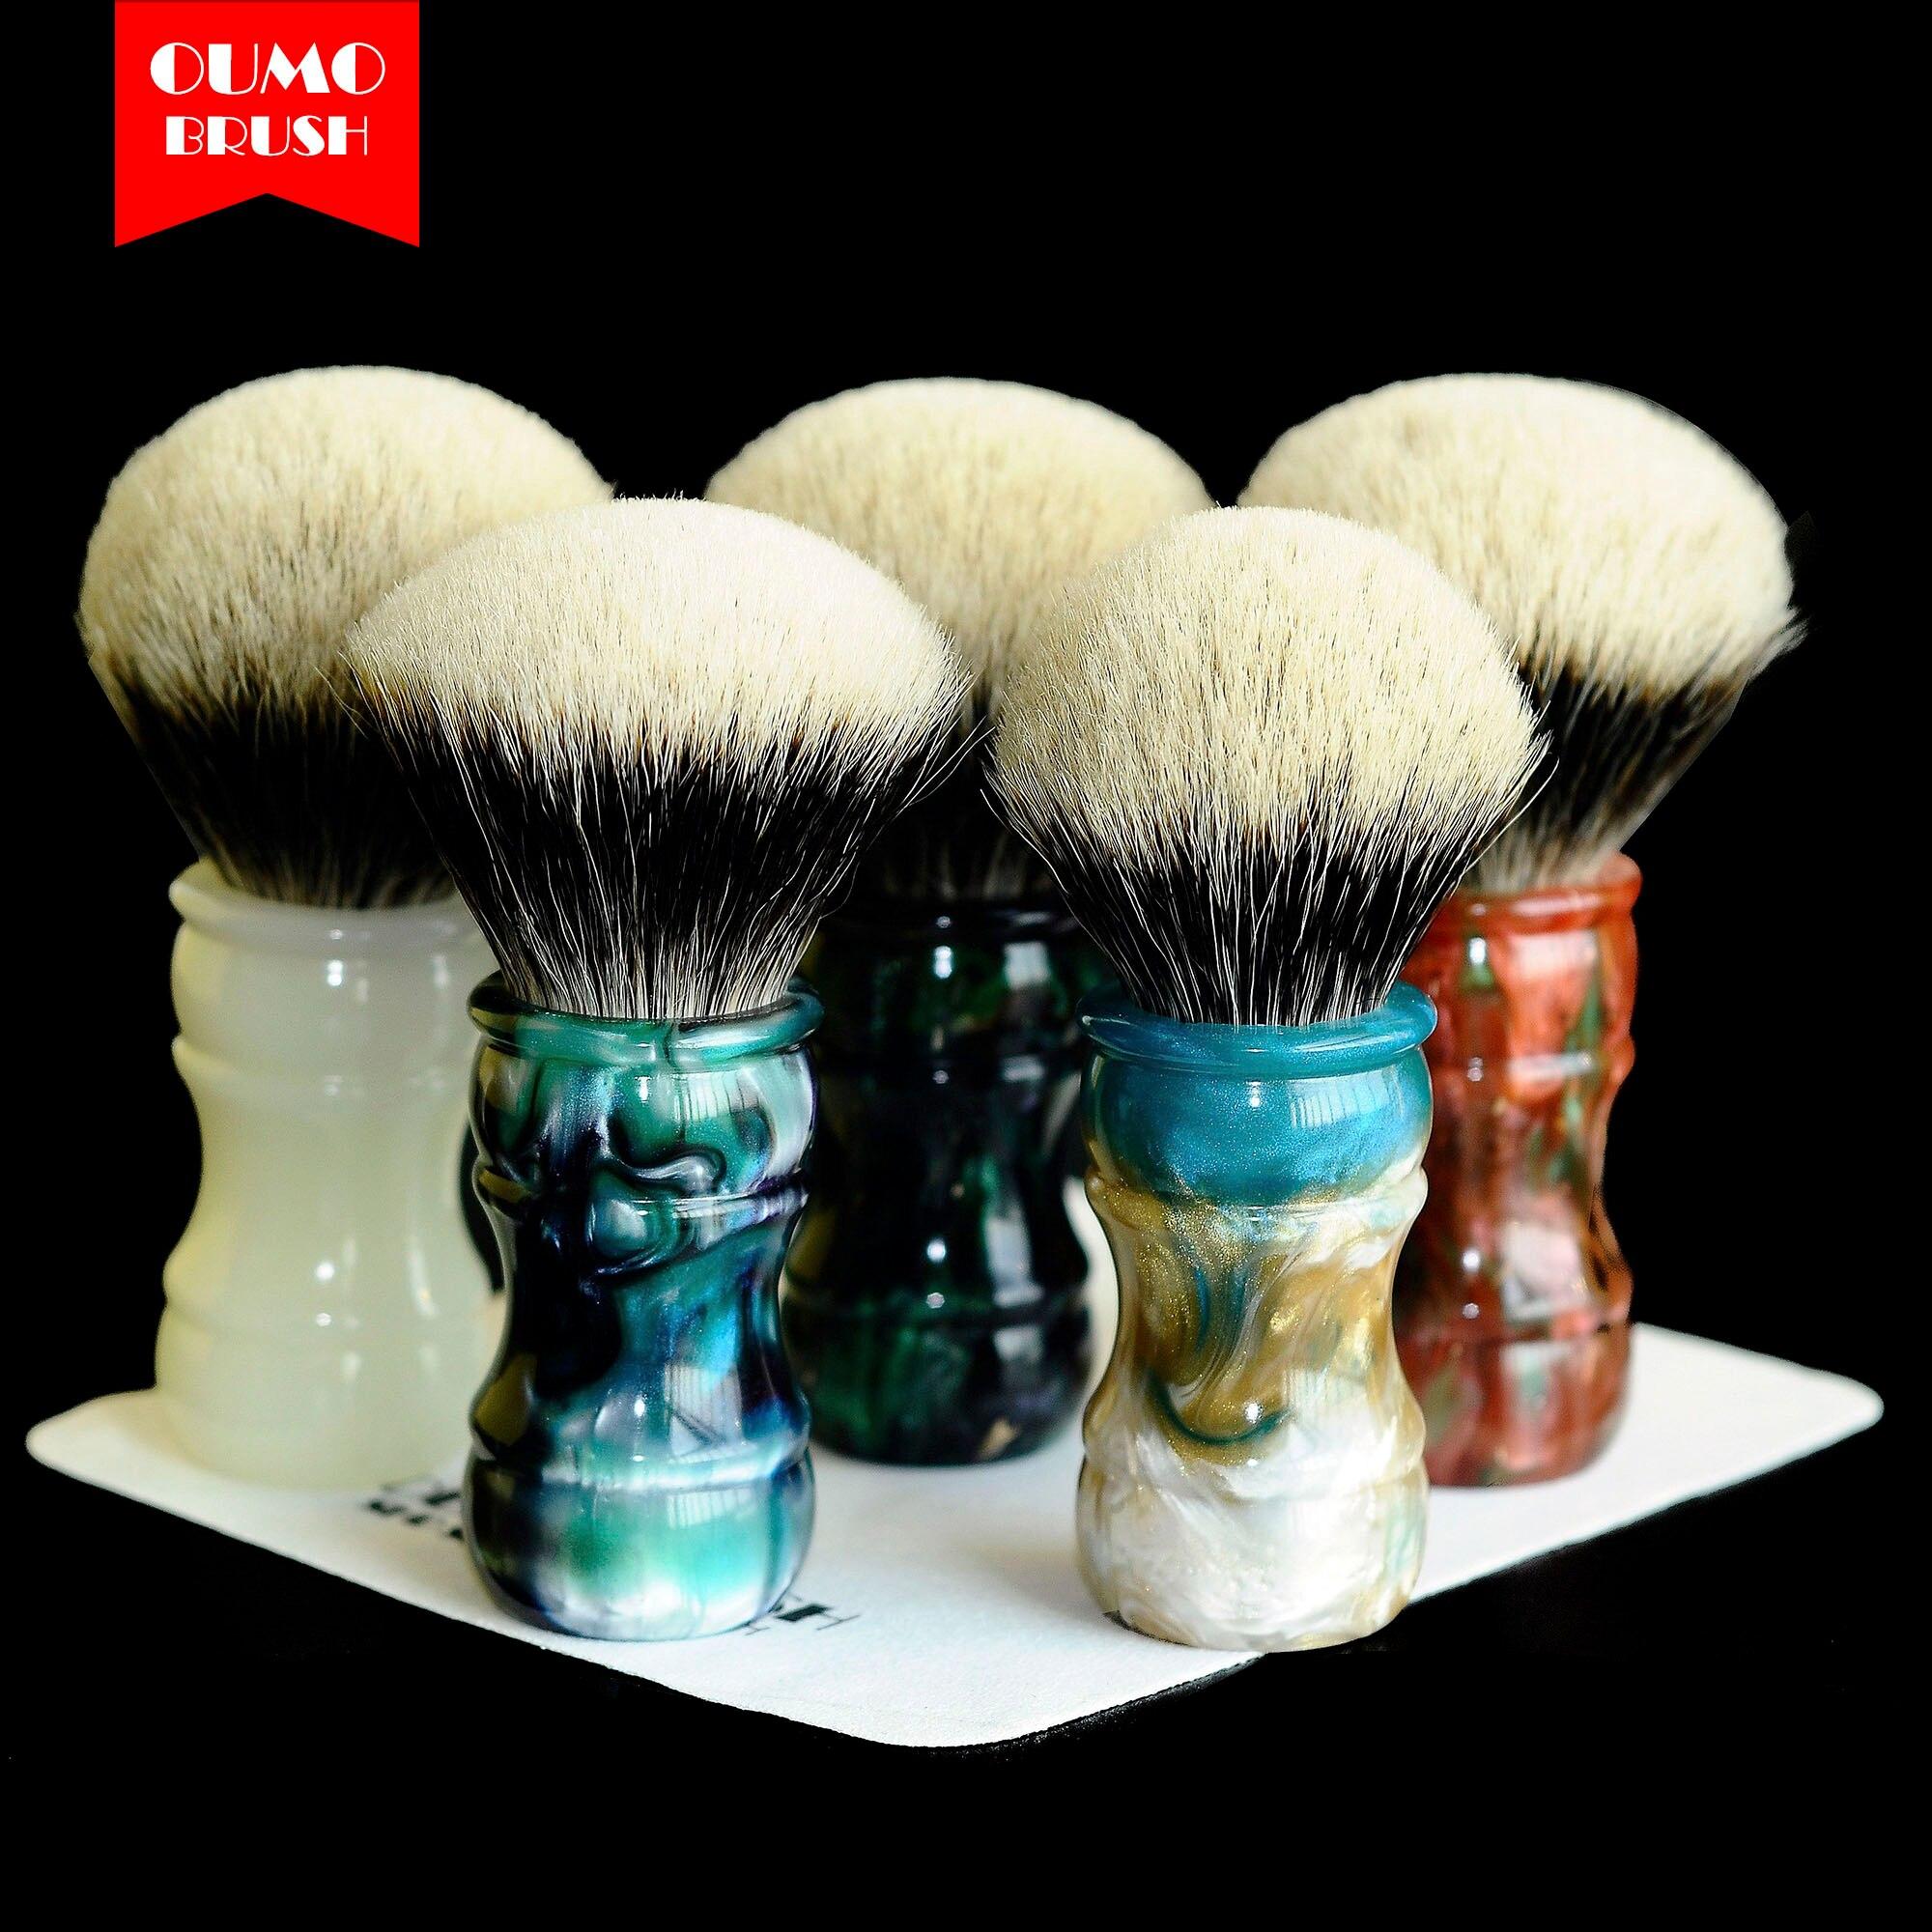 OUMO BRUSH - 2019/9/18 Terracotta Warriors Shaving Brush With SHD Manchuria Finest 2 Band Gel City 26MM28MM